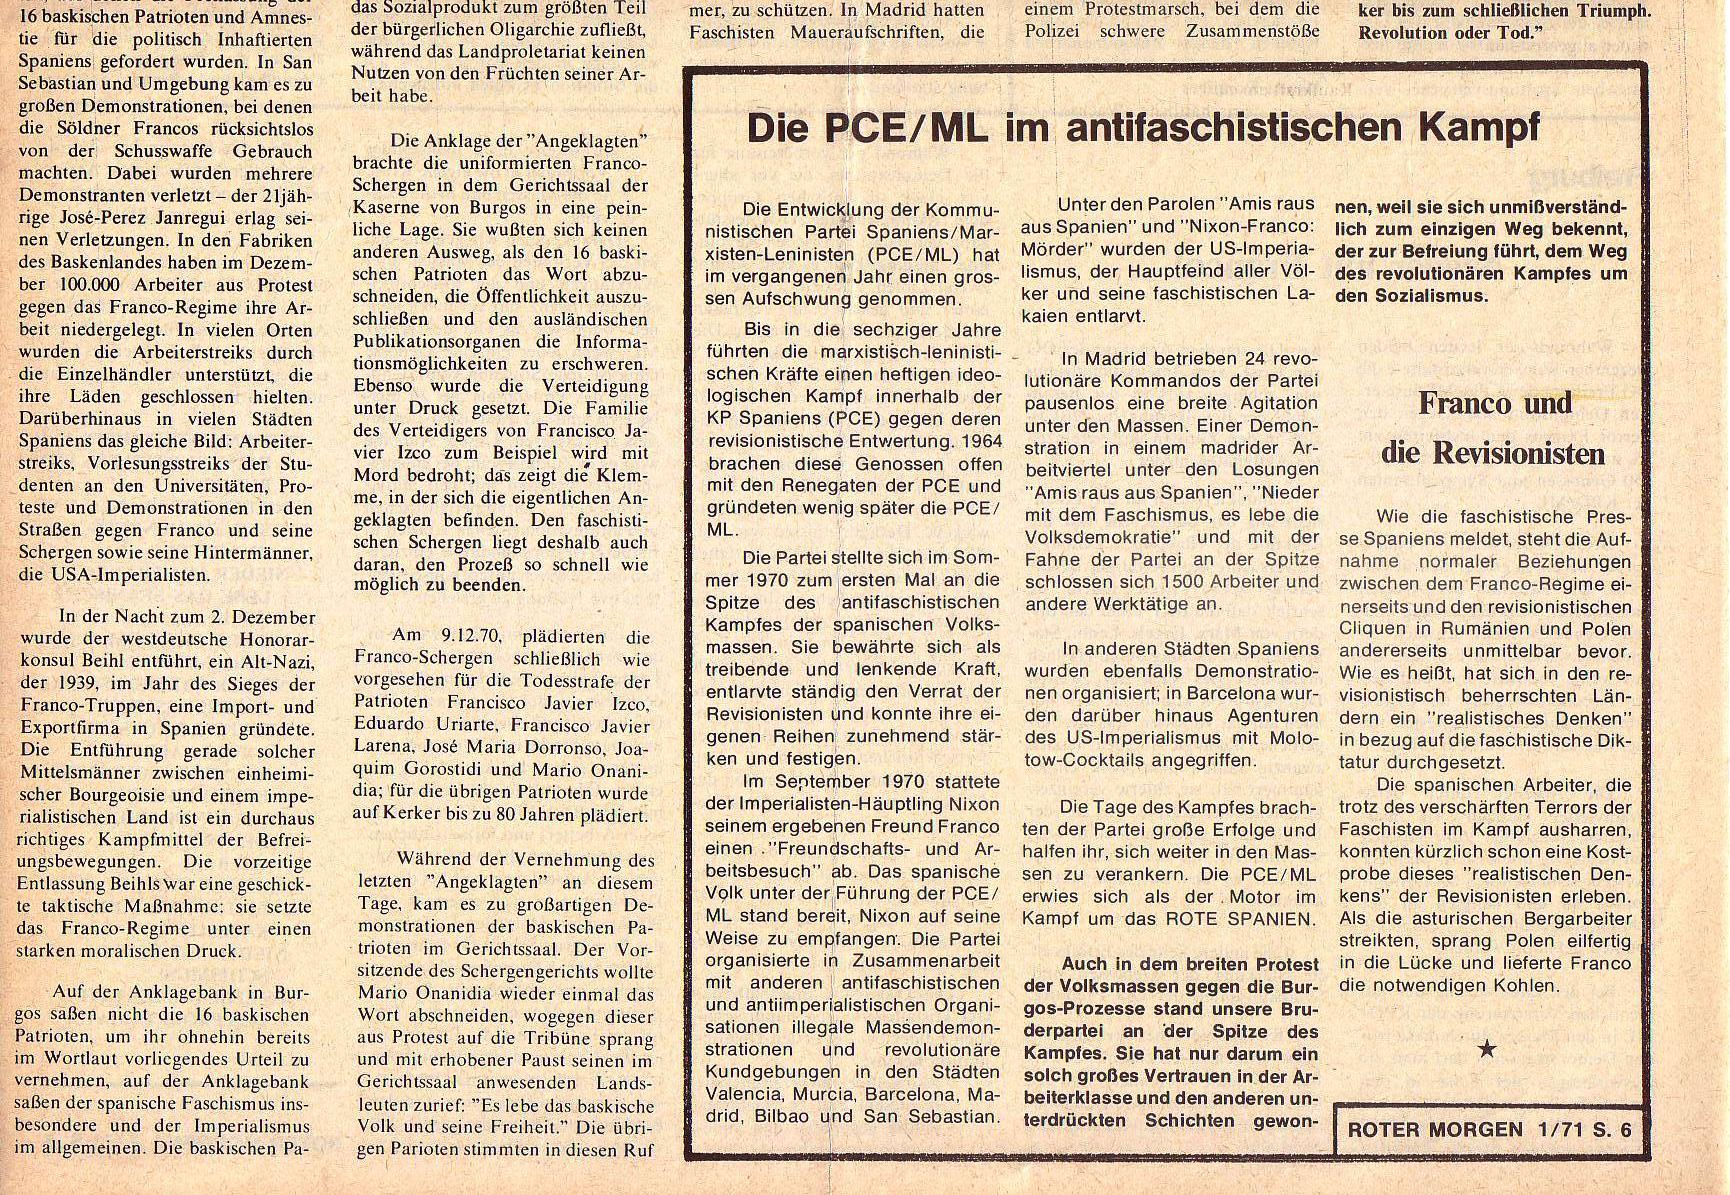 Roter Morgen, 5. Jg., Januar 1971, Nr. 1, Seite 6b